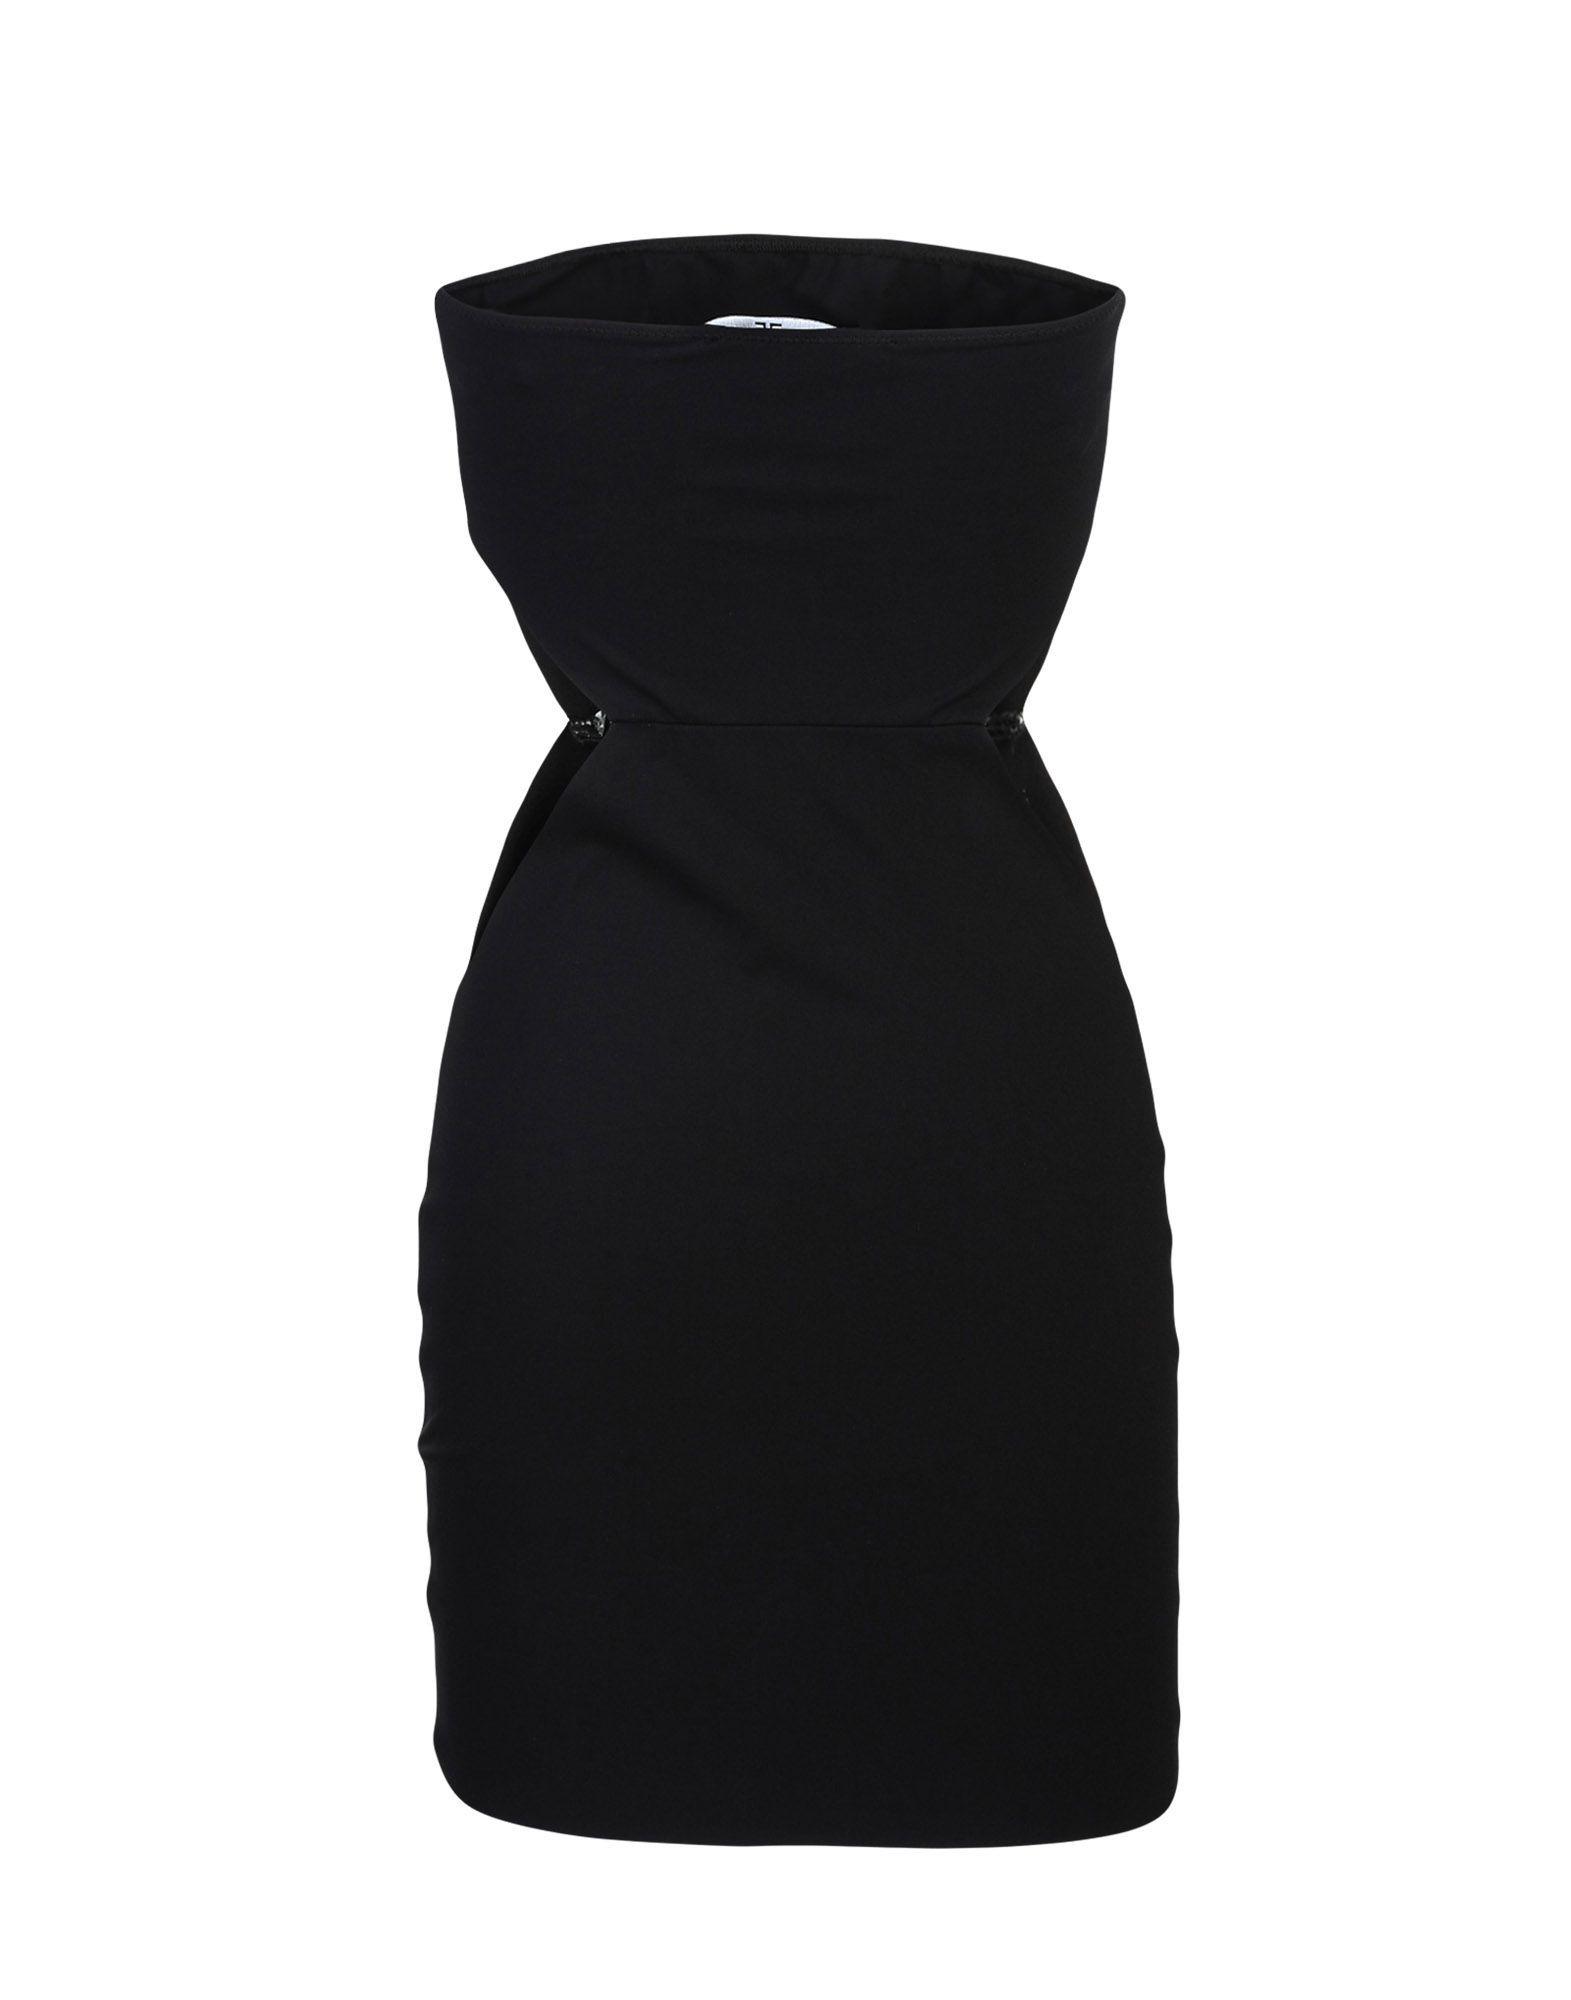 Elisabetta Franchi Black Strapless Short Dress